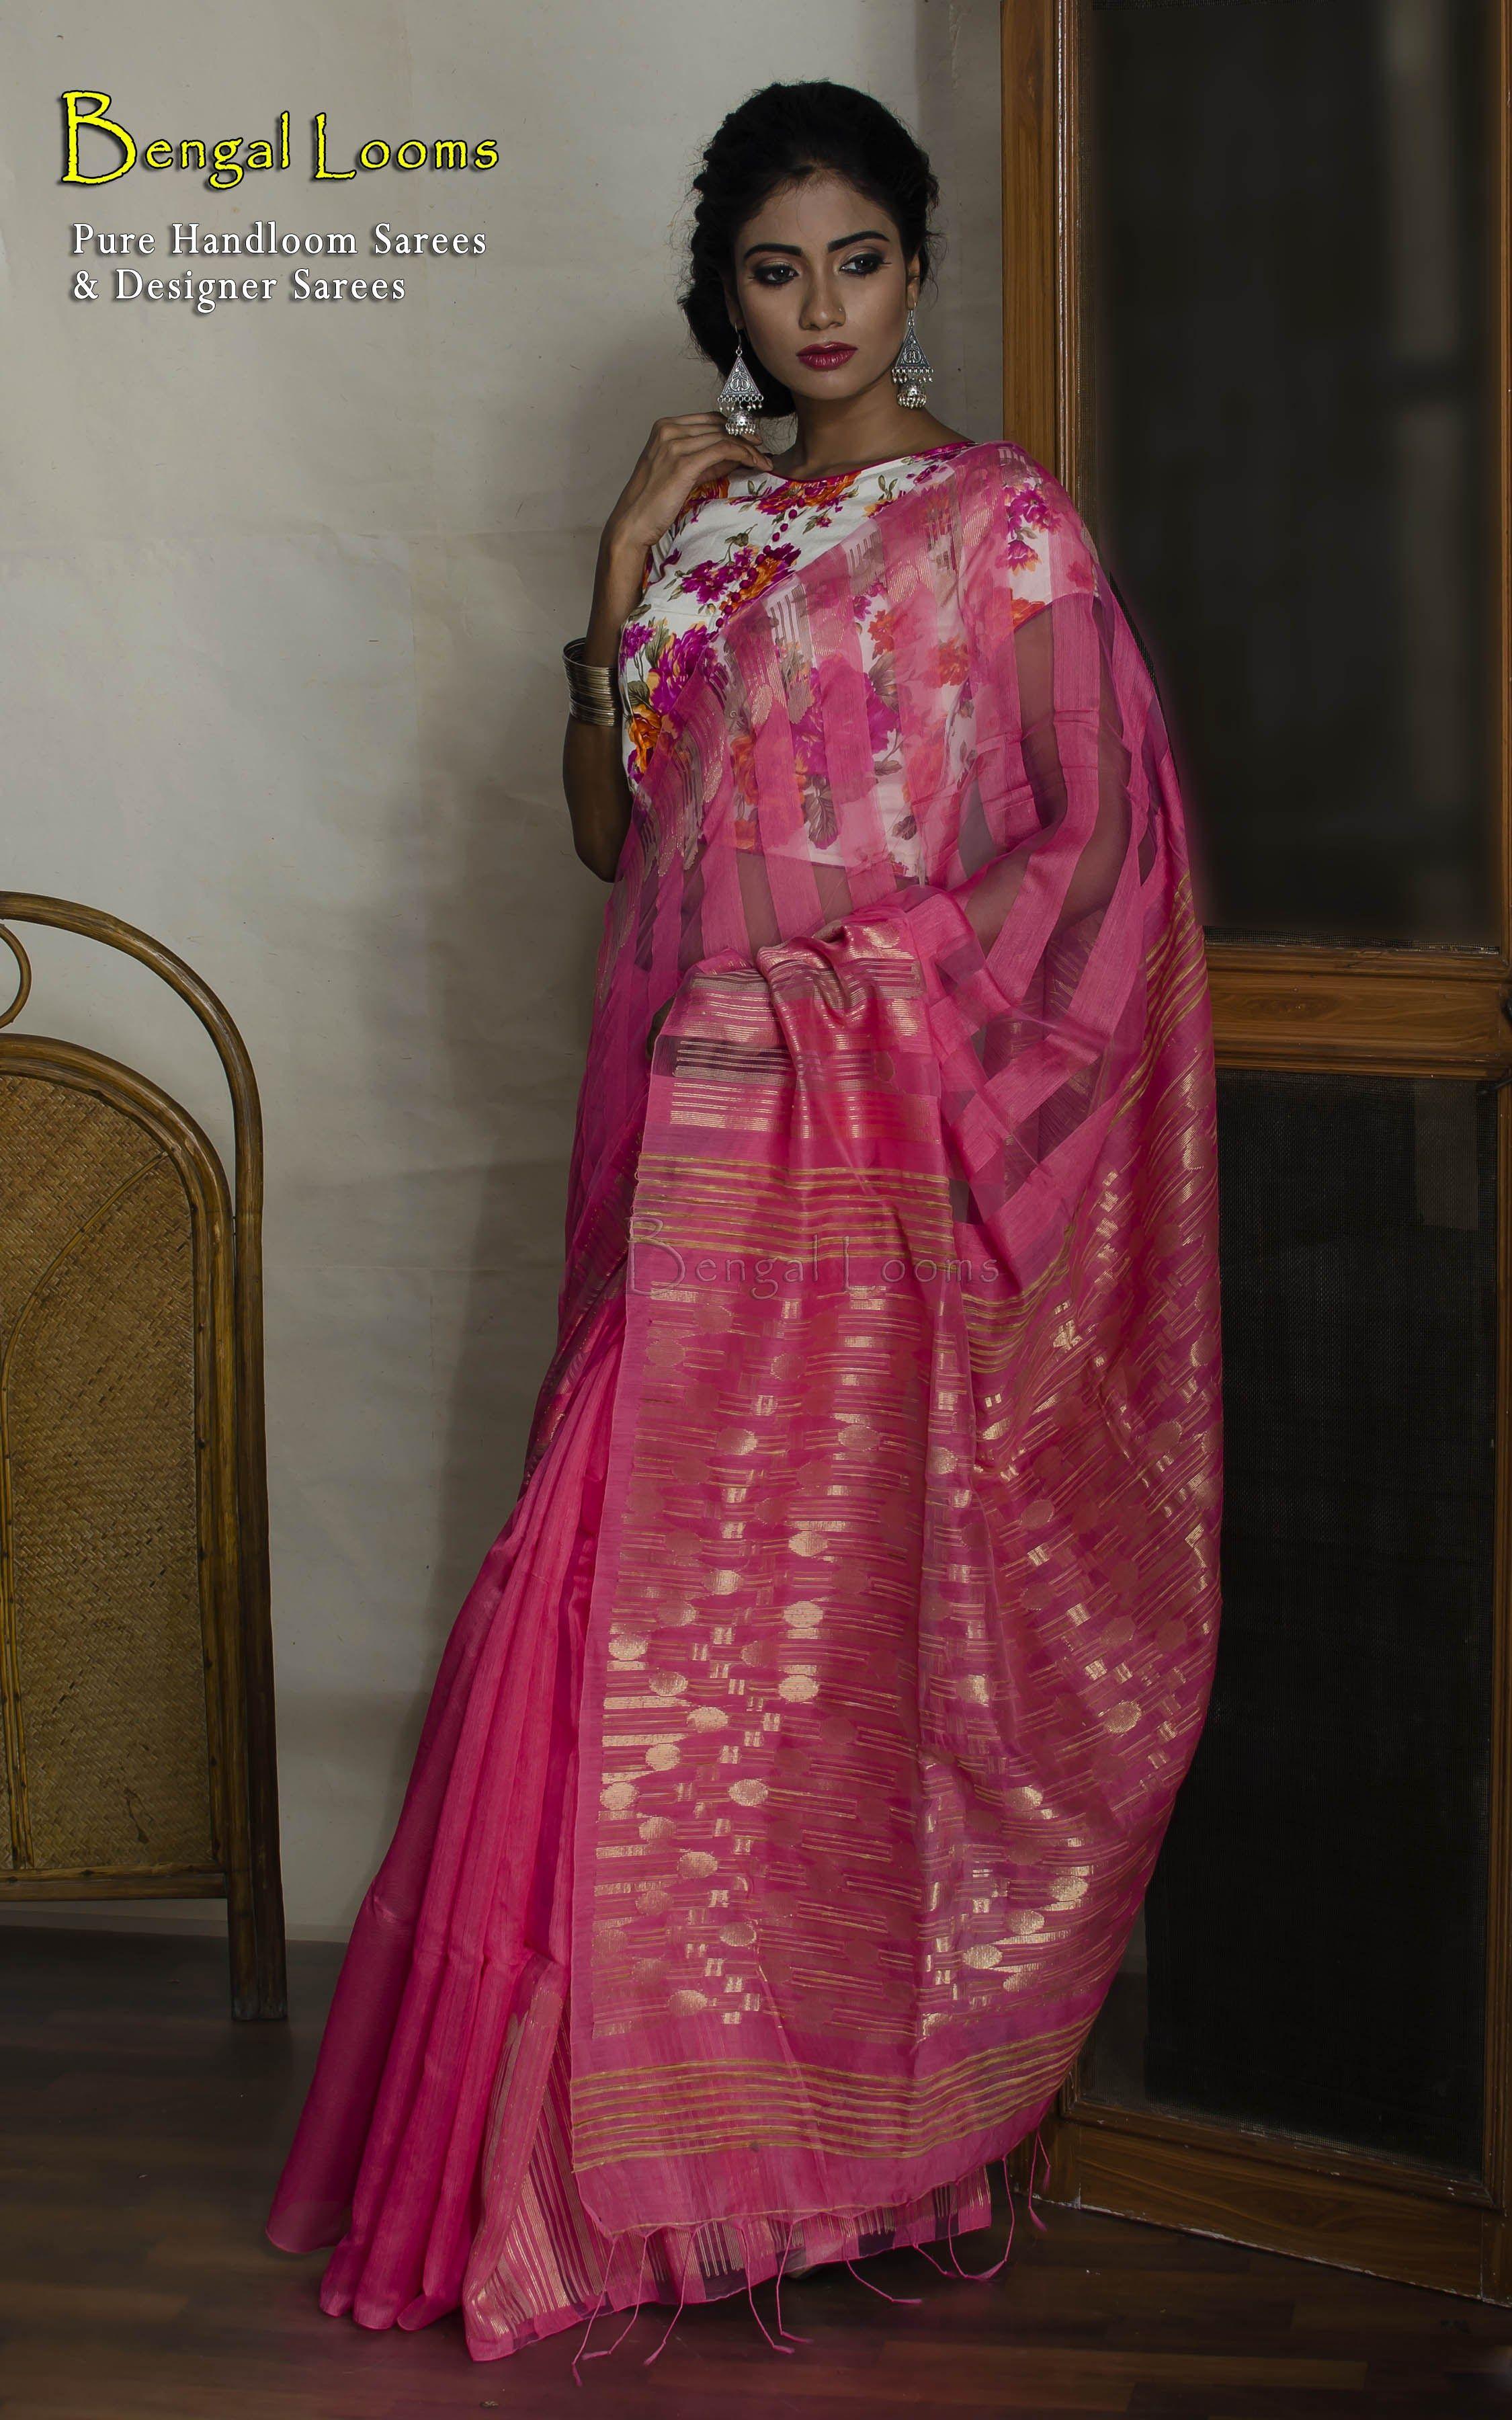 SHOP AT : www.bengallooms.com  This is a #Pure #Handmade #Khadi #ReshamSilk #Saree from #BengalLooms.